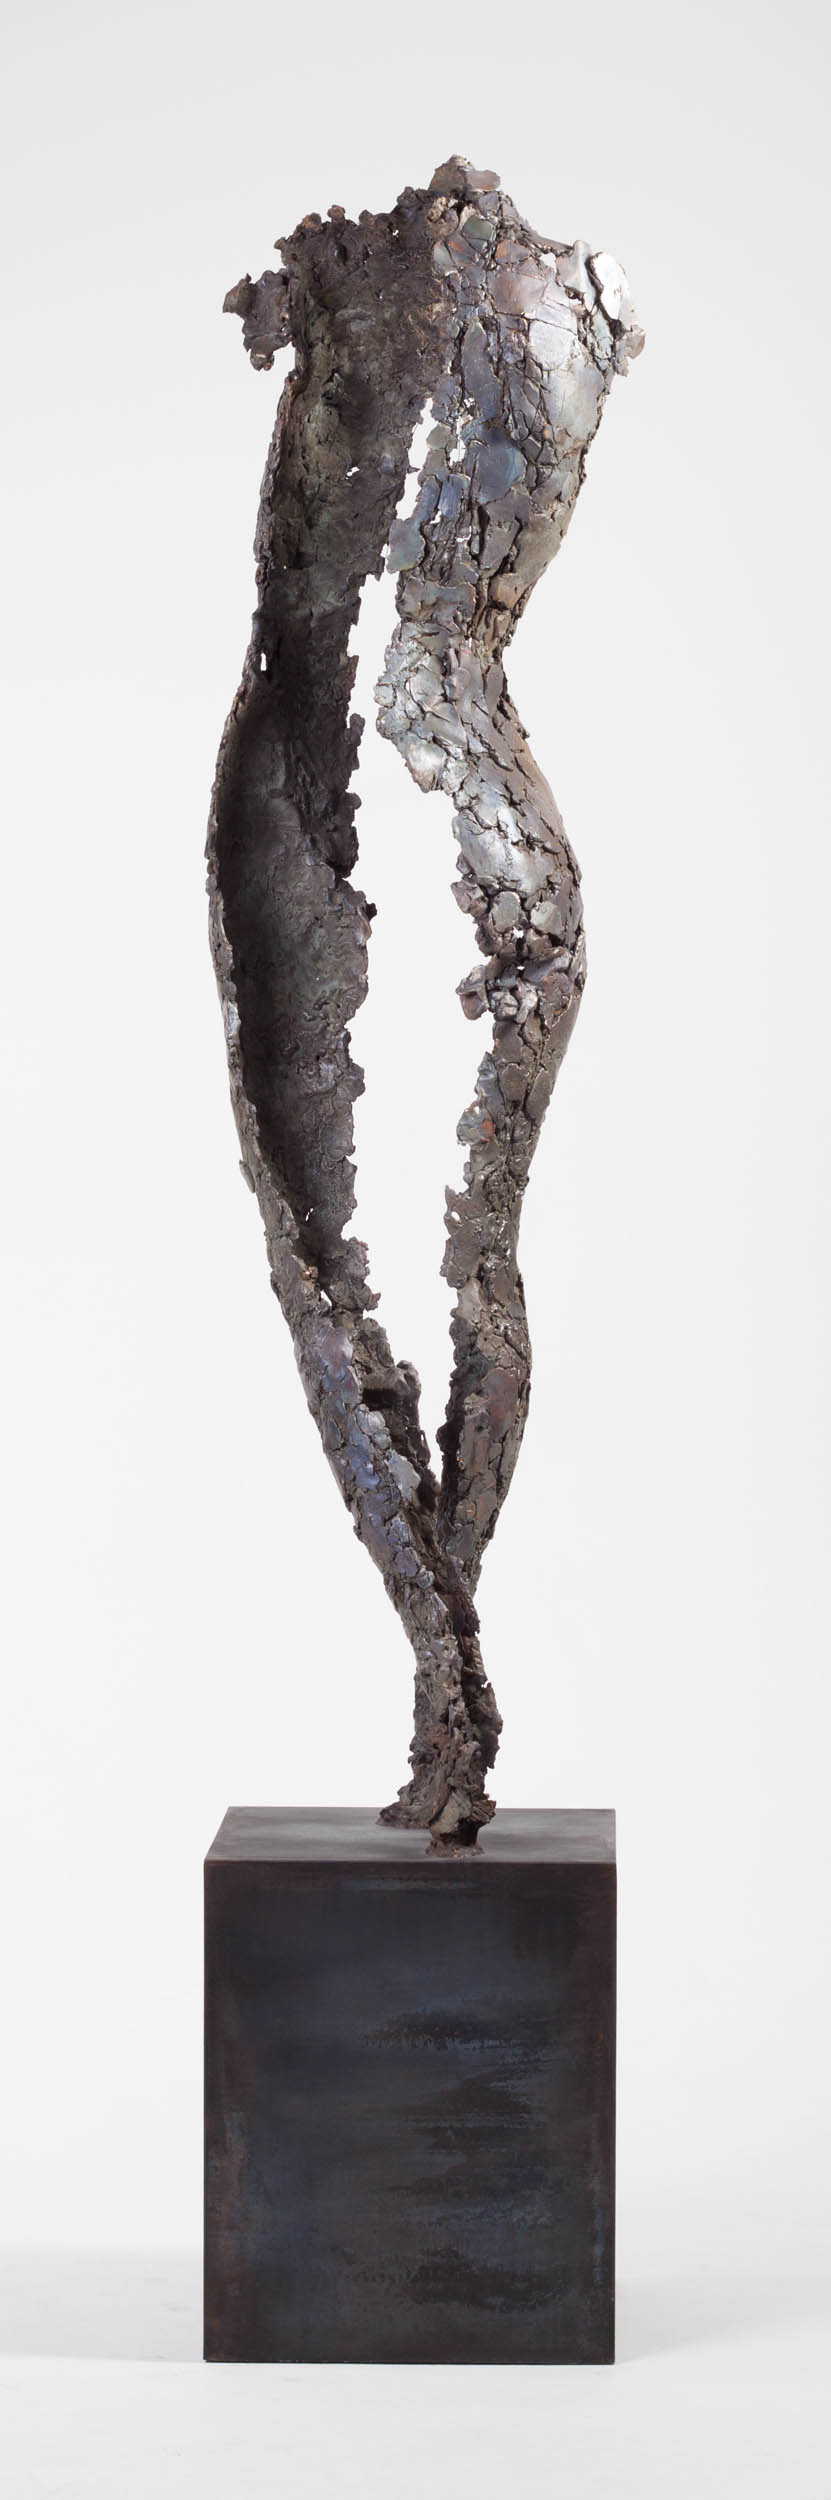 bez-tytulu-z-cyklu-adam-arabski-162191